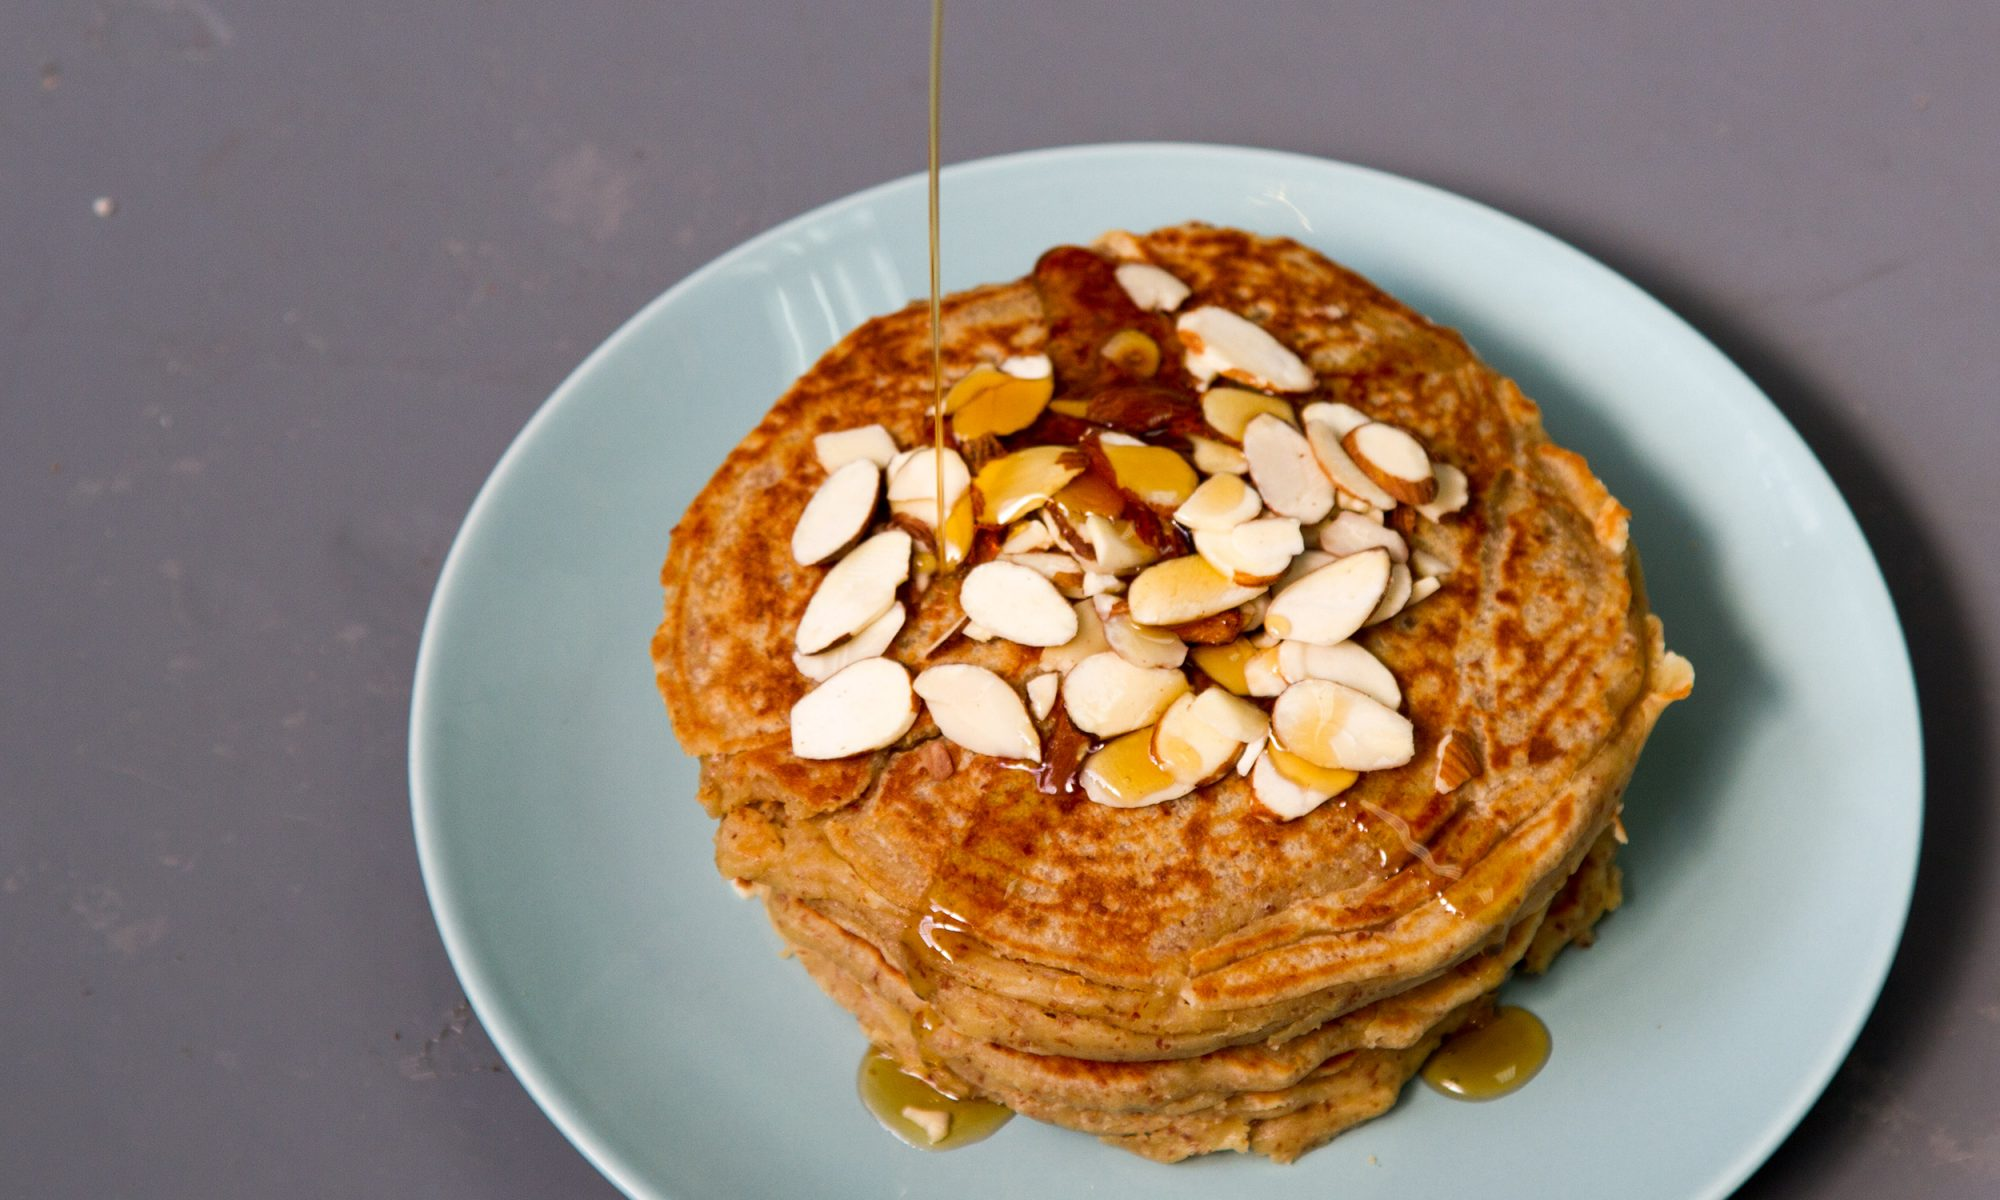 Quinoa Almond Pancakes Are a Gluten-Free, Refined Sugar-Free Brunch Victory